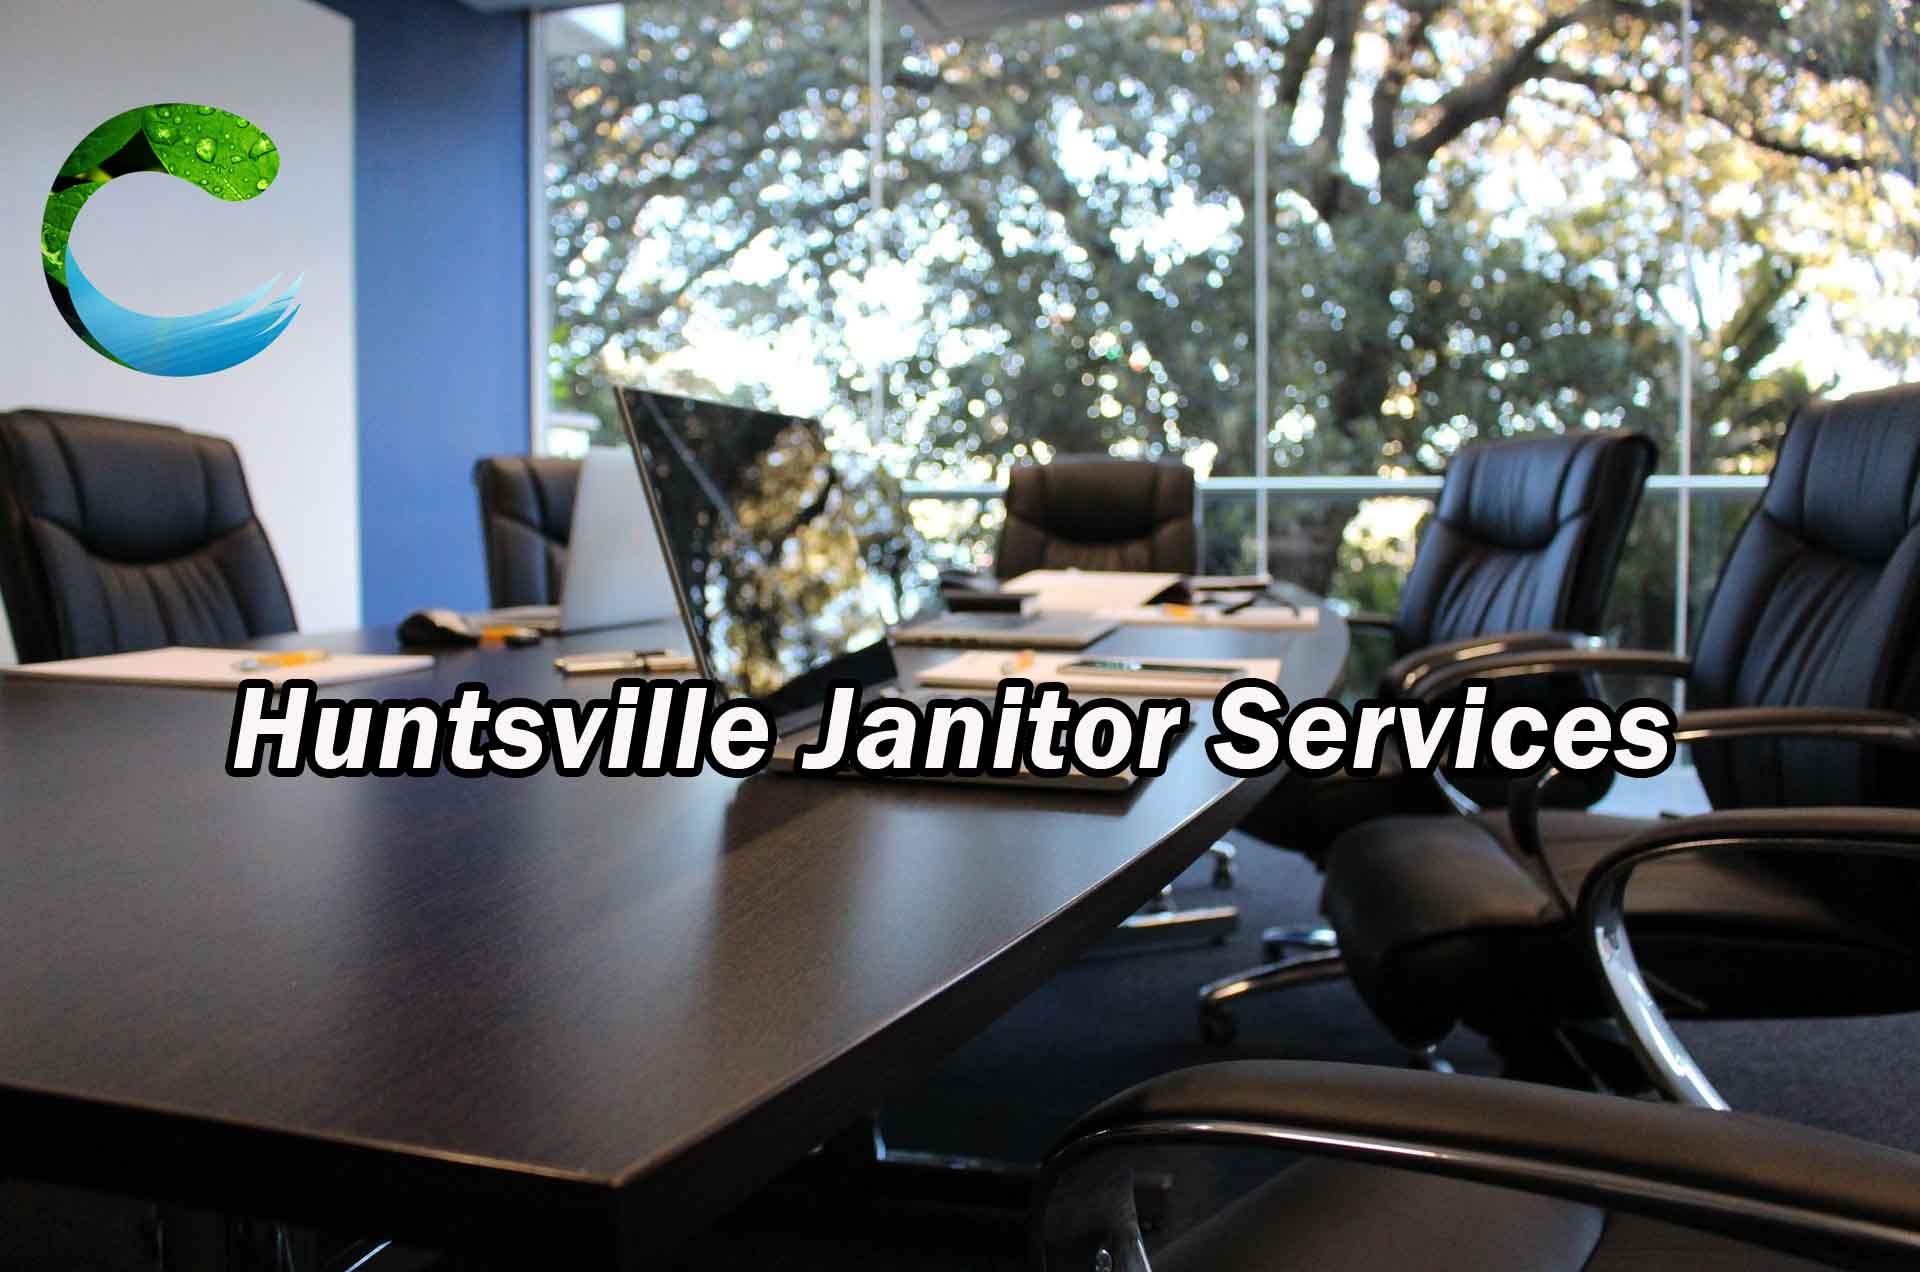 Huntsville Janitor Services